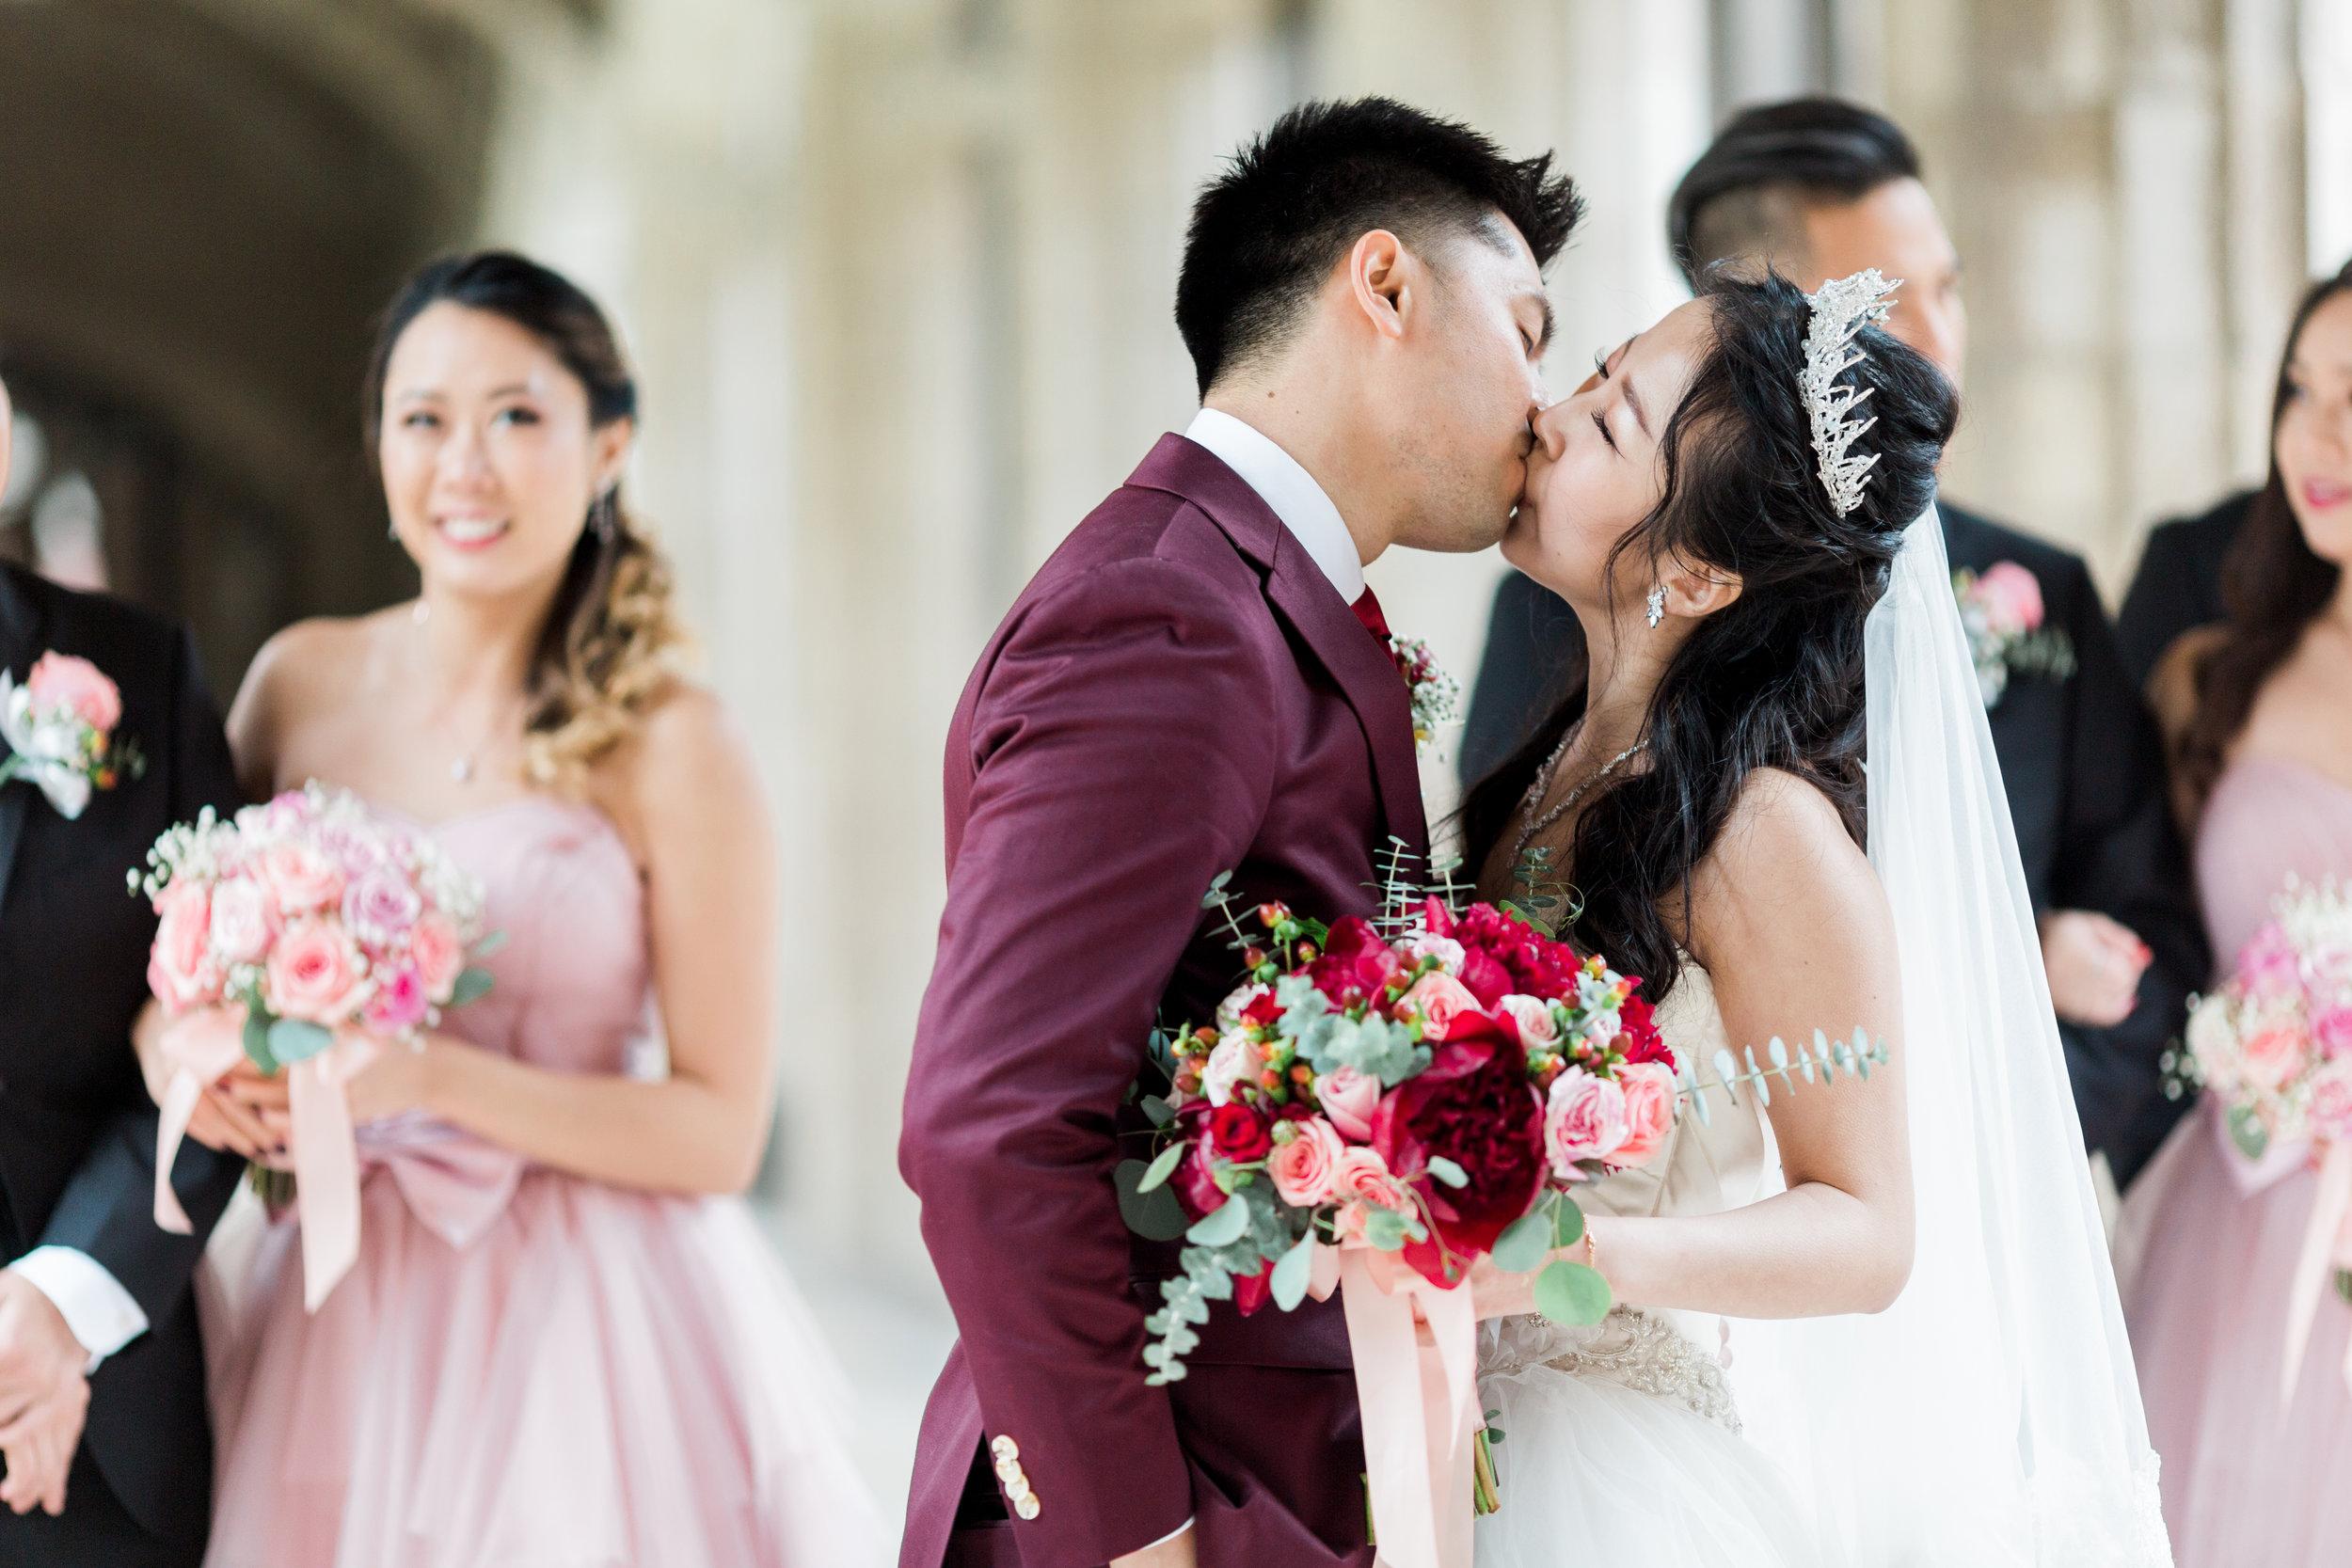 Parkview Manor Wedding - Bridal Portraits-24.jpg